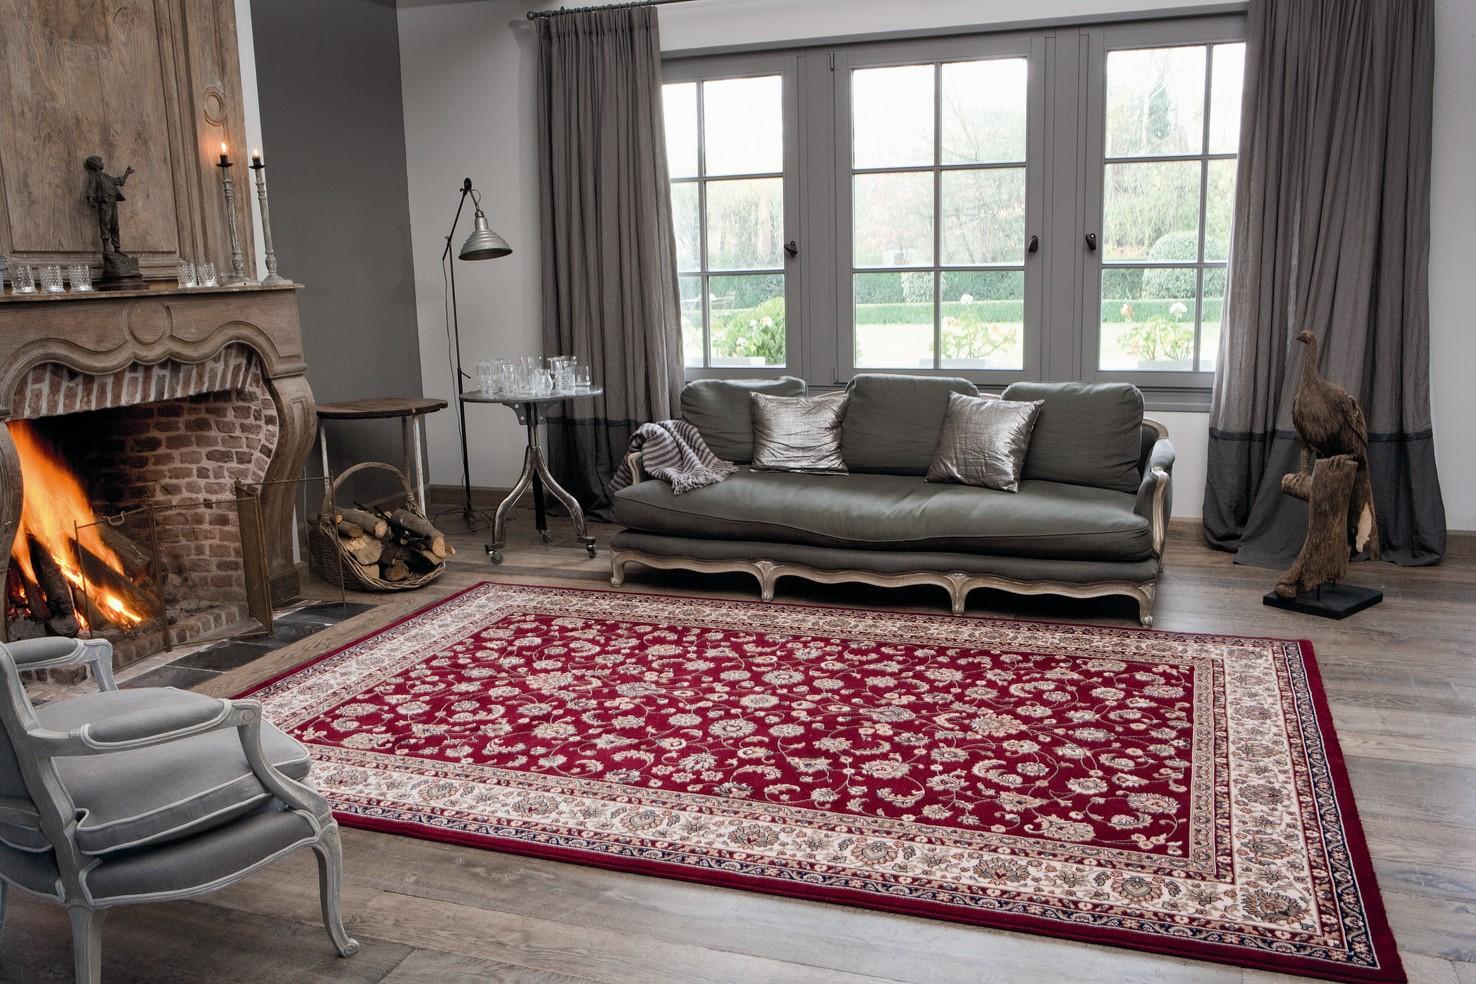 C mo eligir alfombras y felpudos por tu casa stampaprint - Arredamento tappeti ...